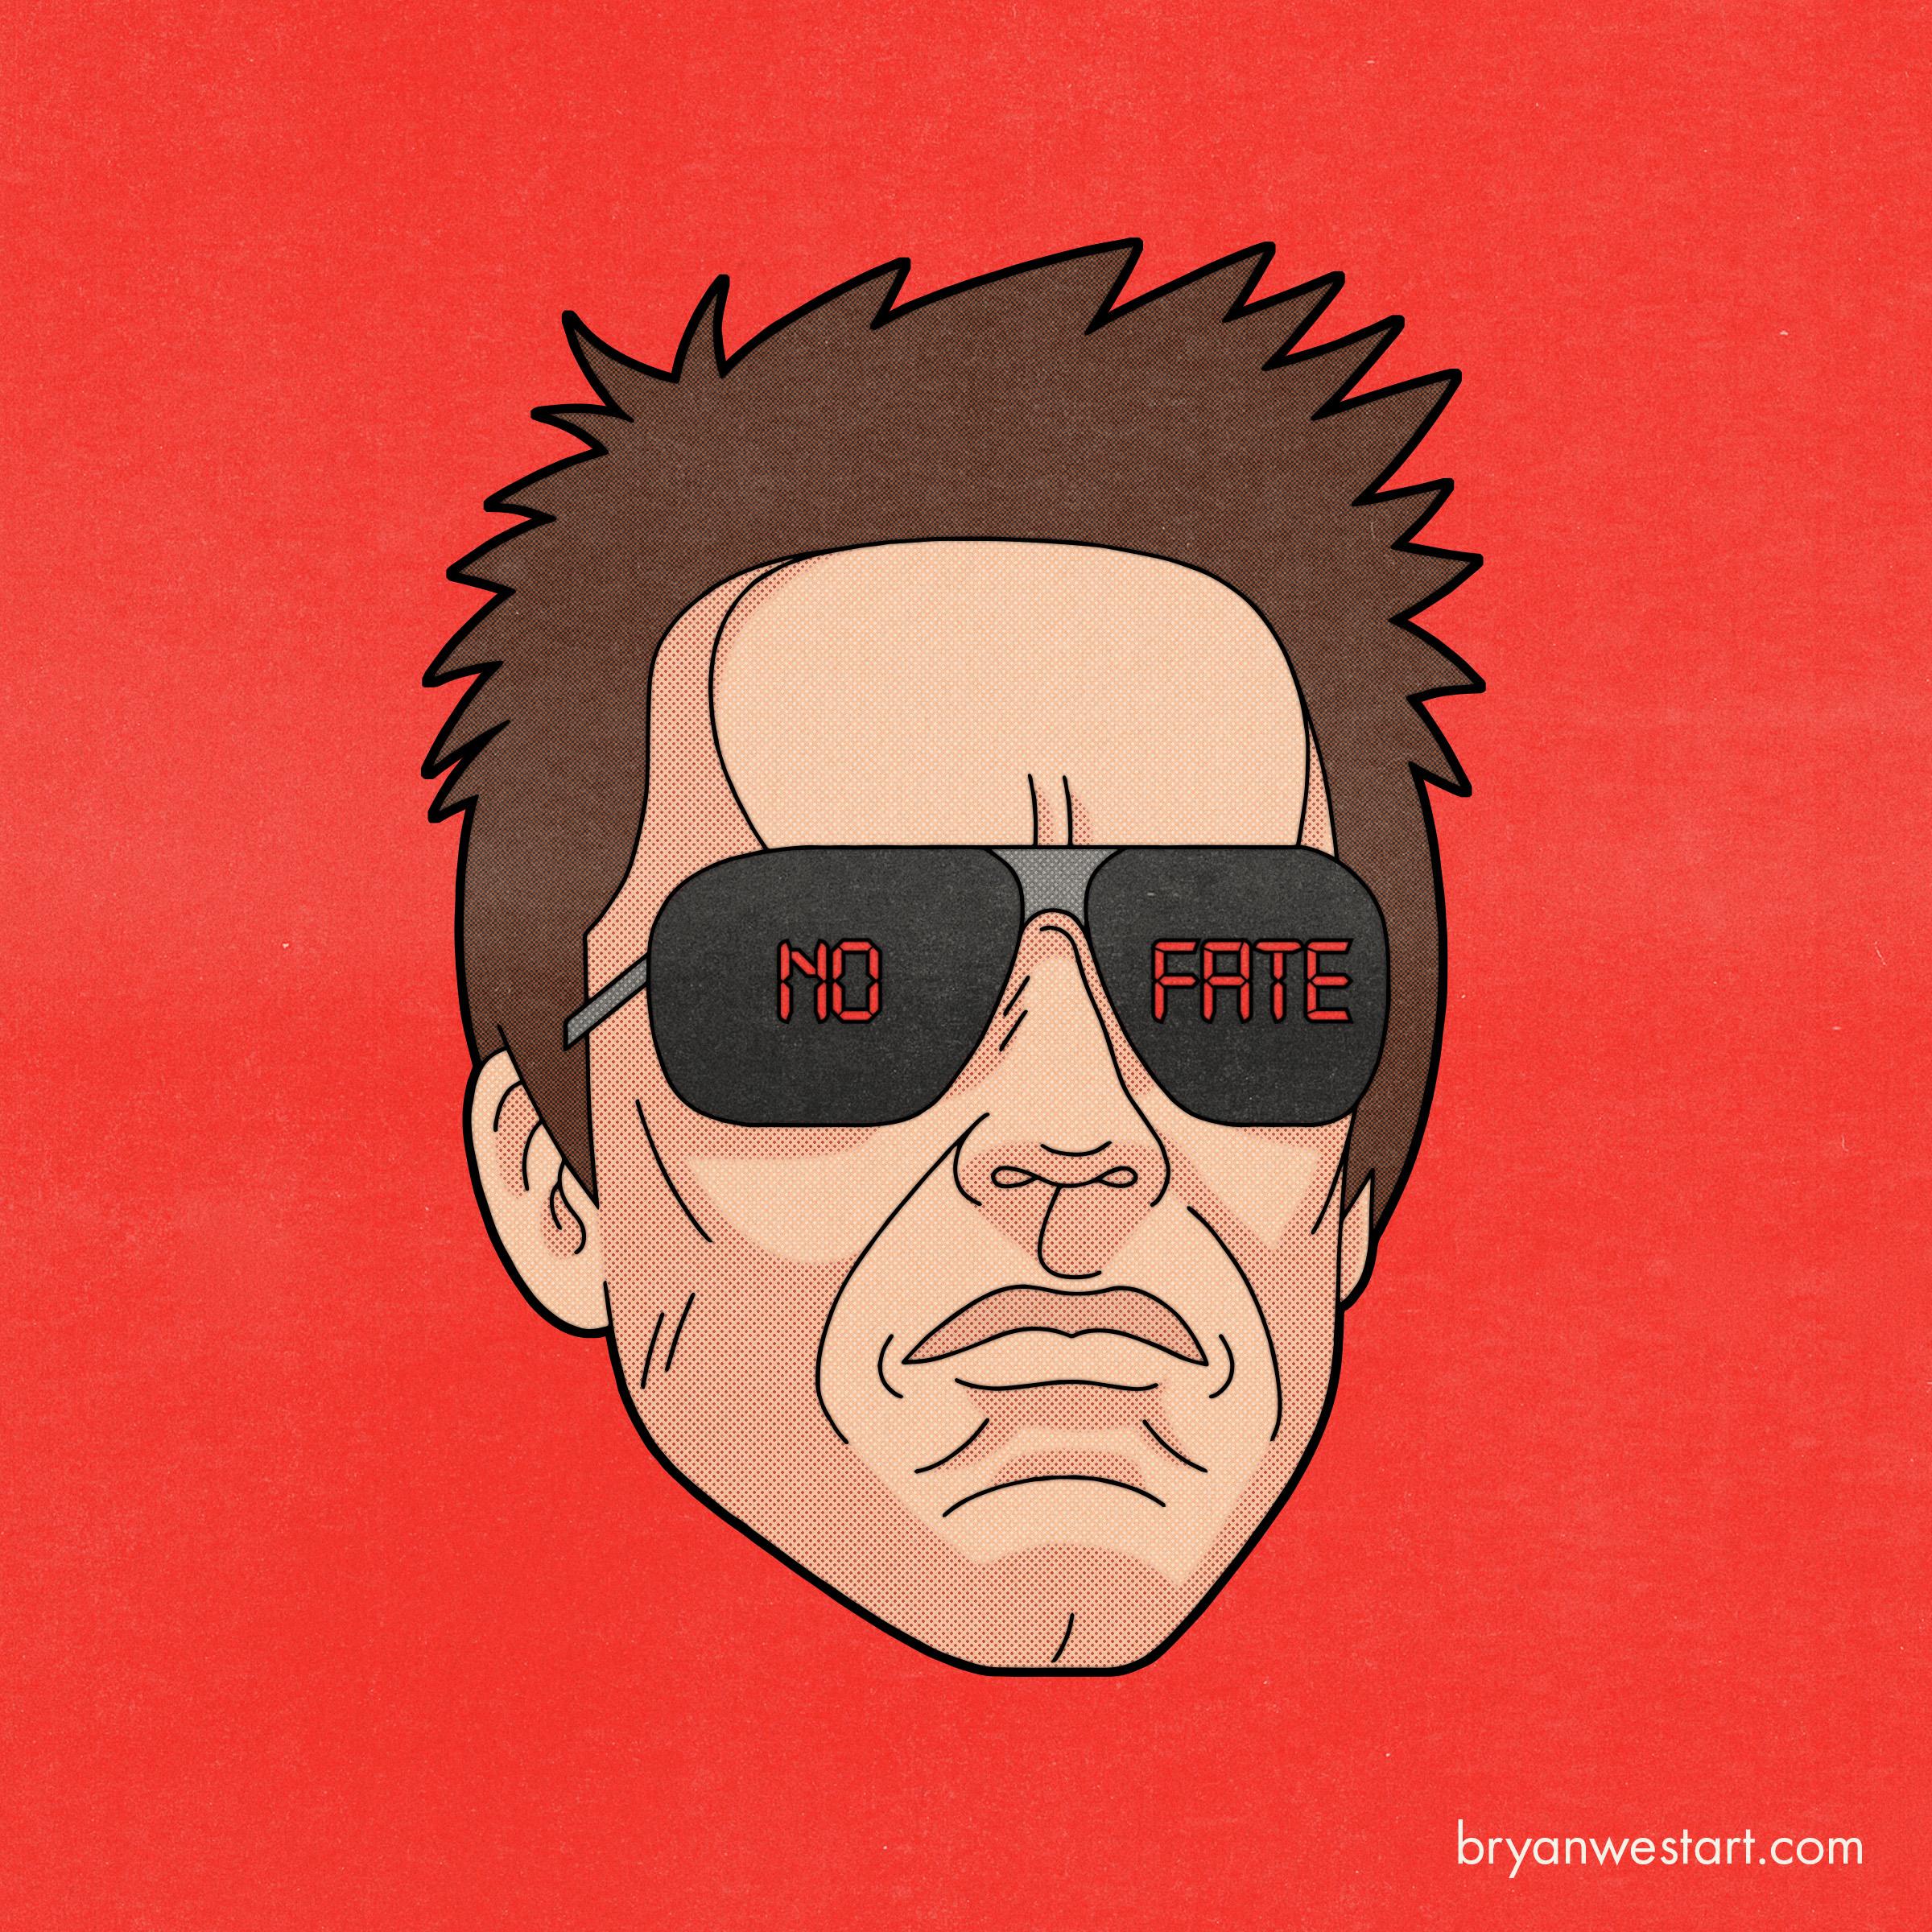 Terminator_NoFate_V2.jpg